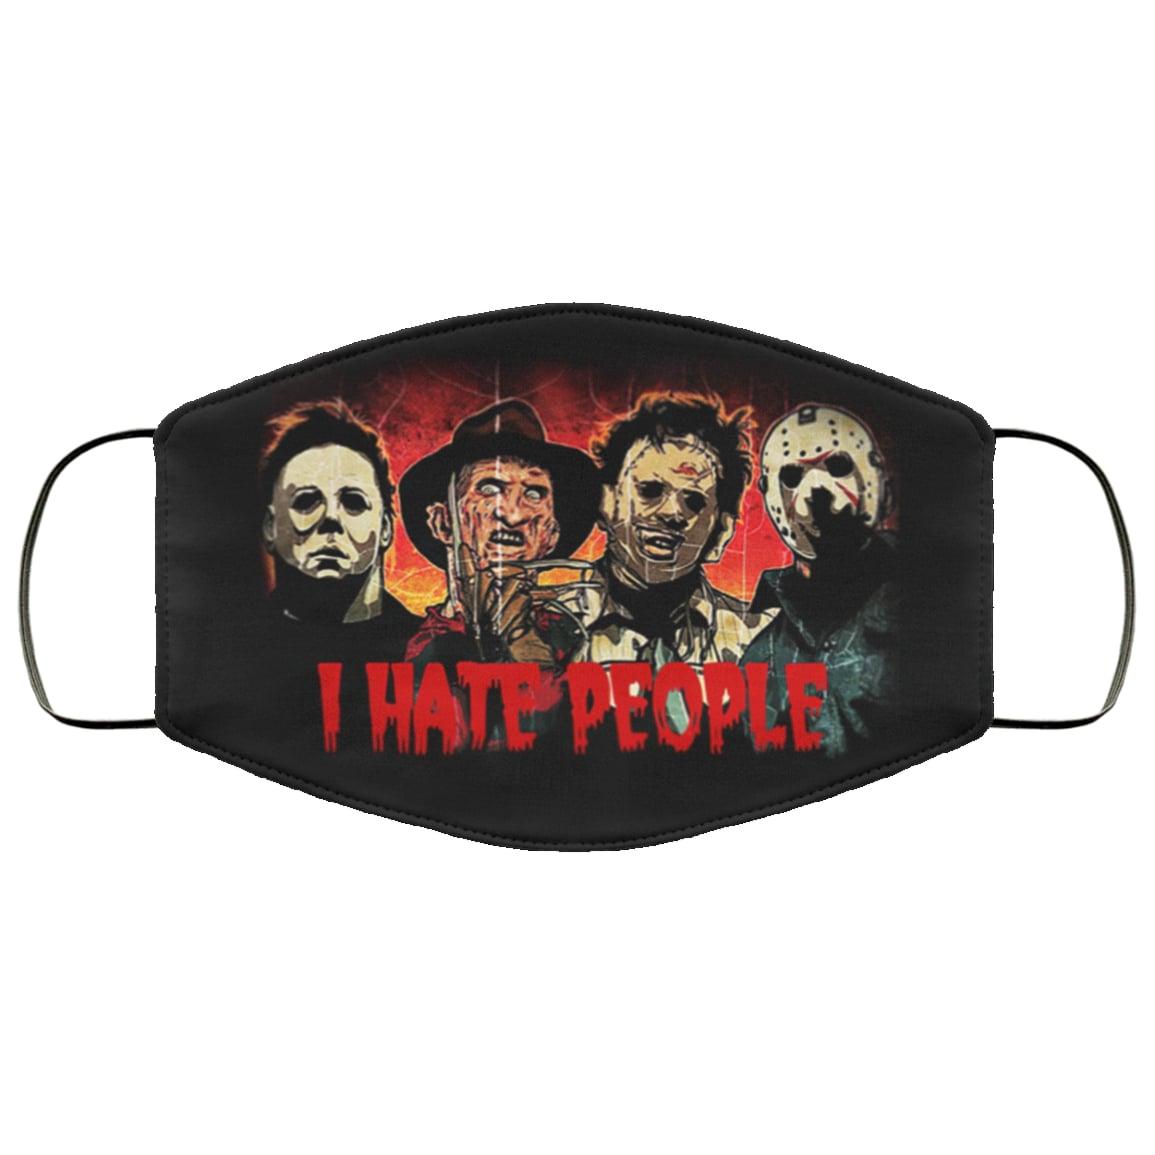 I hate people horror jason michael myers leatherfaces freddy face mask 3